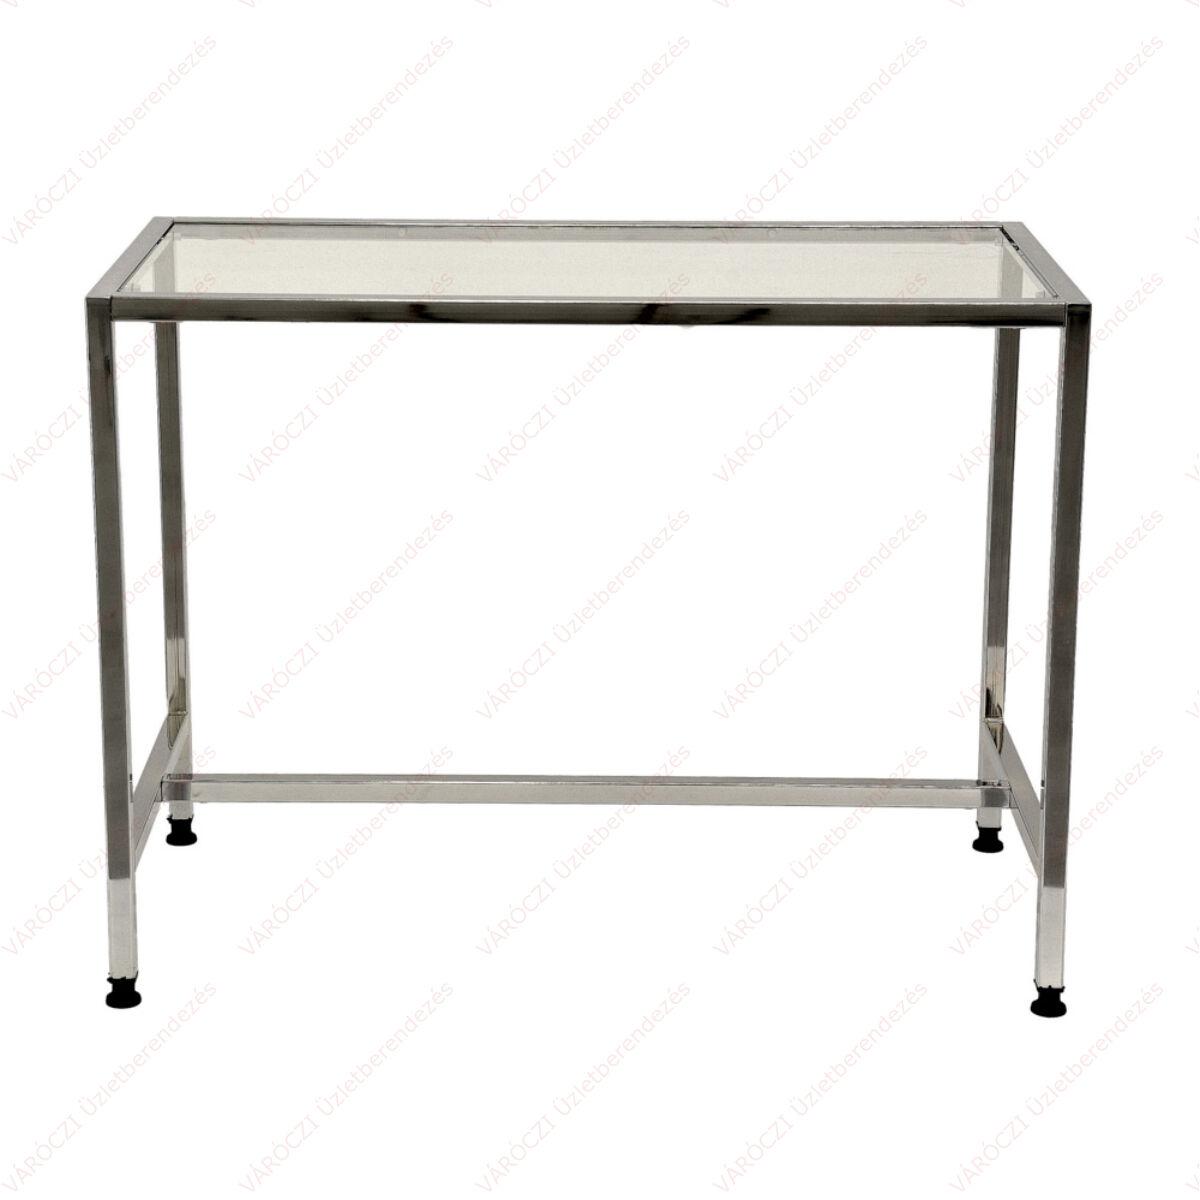 asztalszett 3 db os 70 x 50 80 x 50 90 x 50 50 60 70 cm. Black Bedroom Furniture Sets. Home Design Ideas